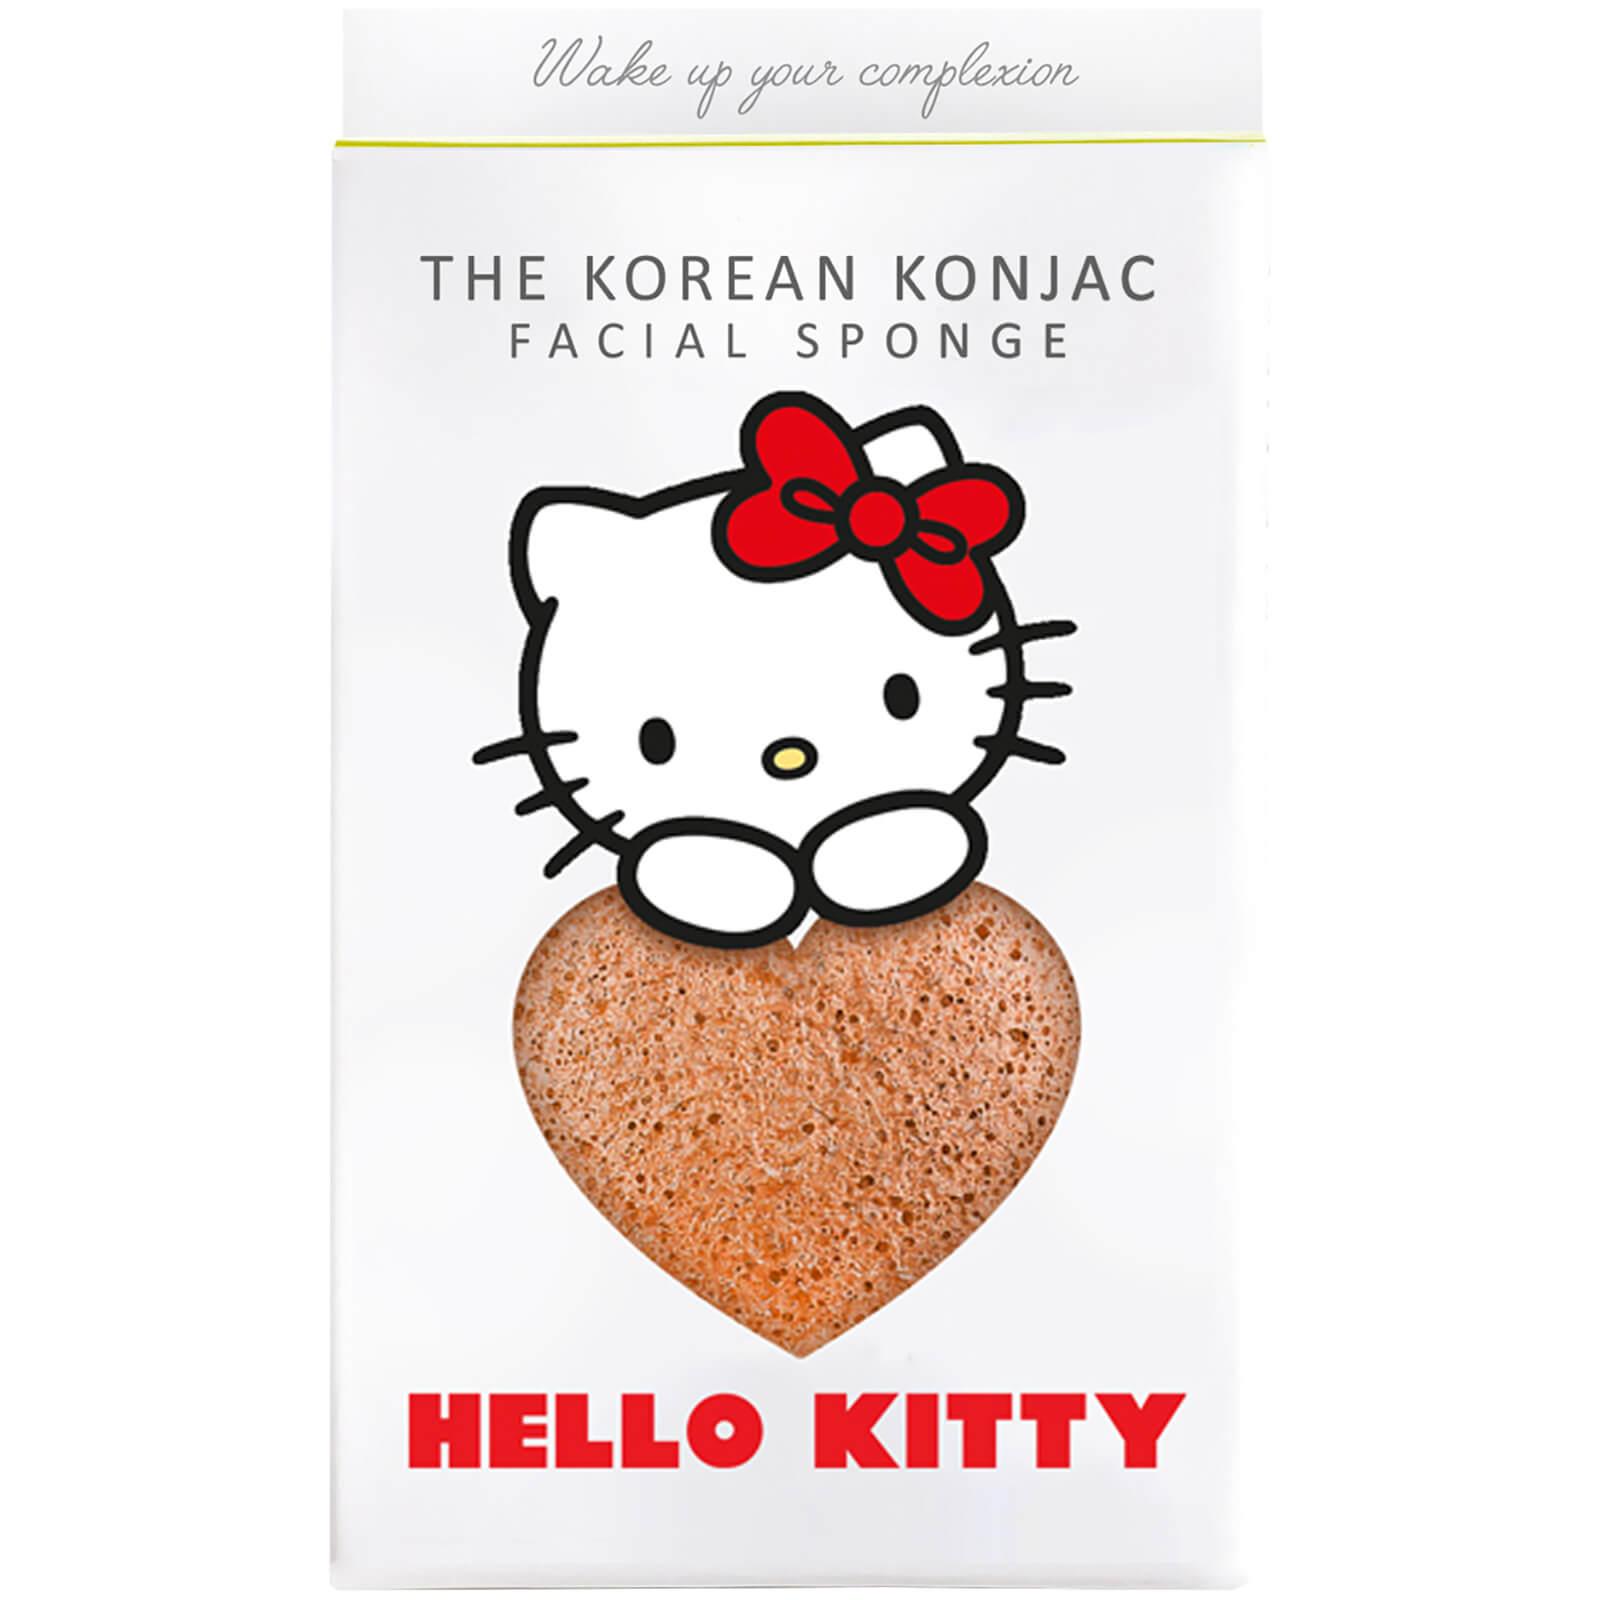 The Konjac Sponge Company Éponge Konjac, Boîte et Crochet Sanrio Hello Kitty The Konjac Sponge Company 30g – Argile Rose